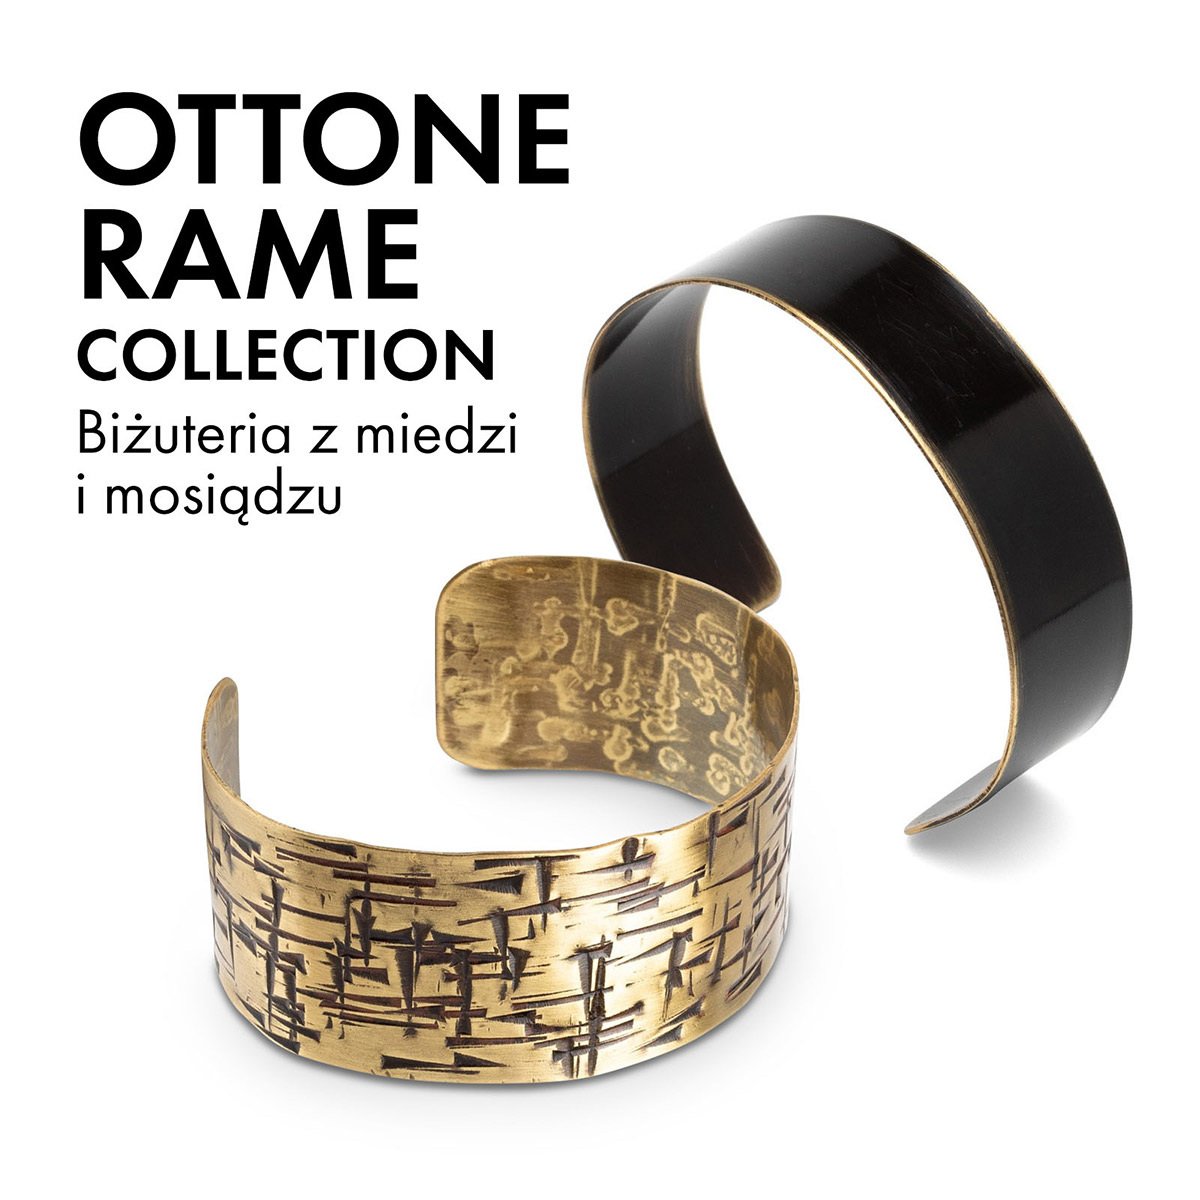 Kolekcja OTTONE RAME